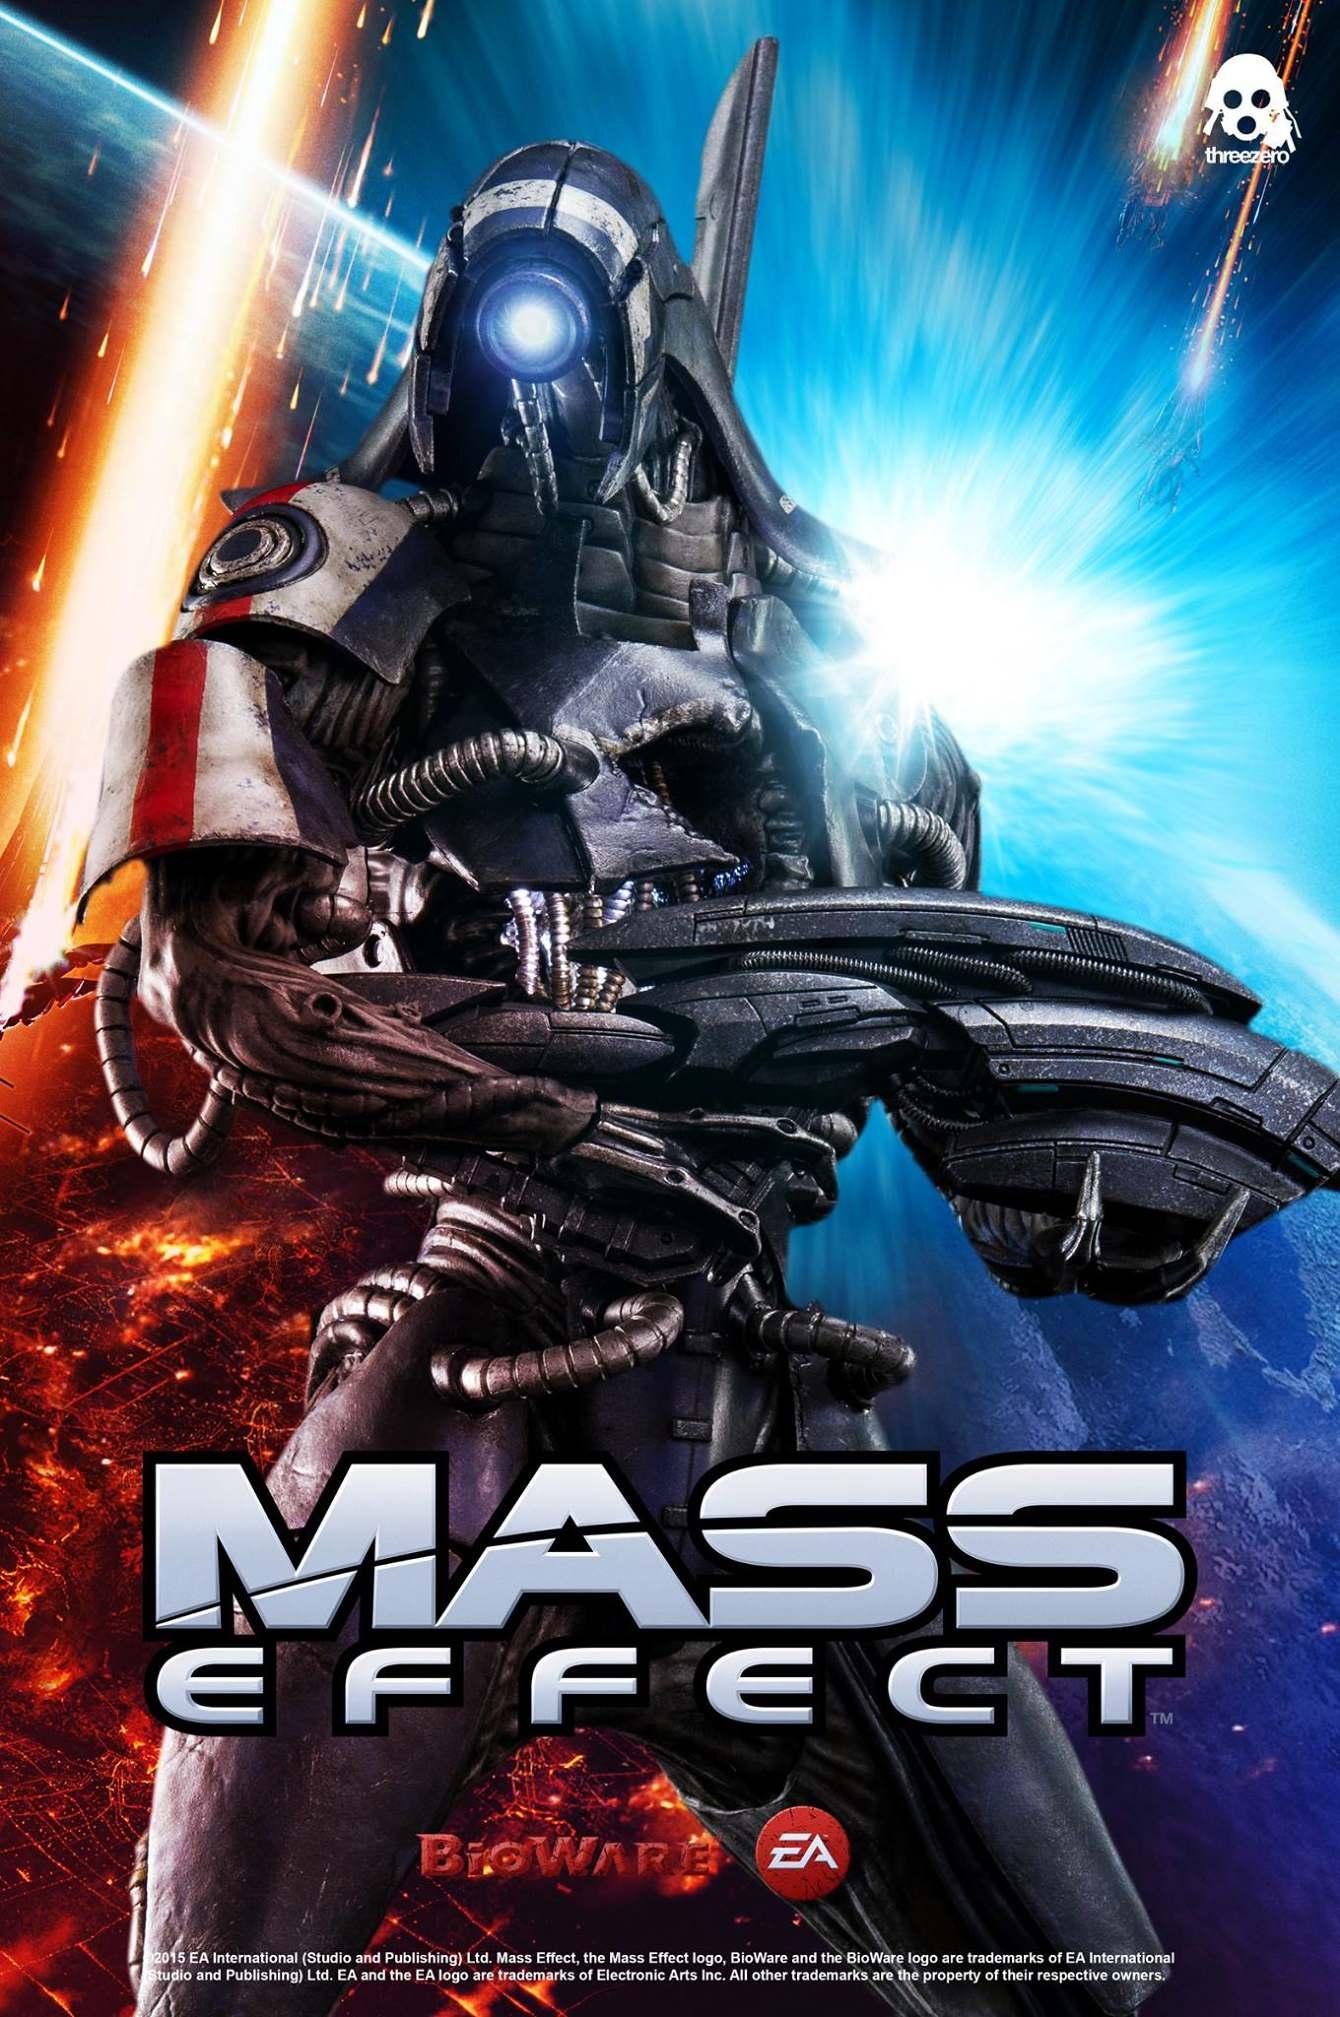 ThreeZero-Bioware-video-game-Legion-Mass-Effect-figure-_1340_c.jpg